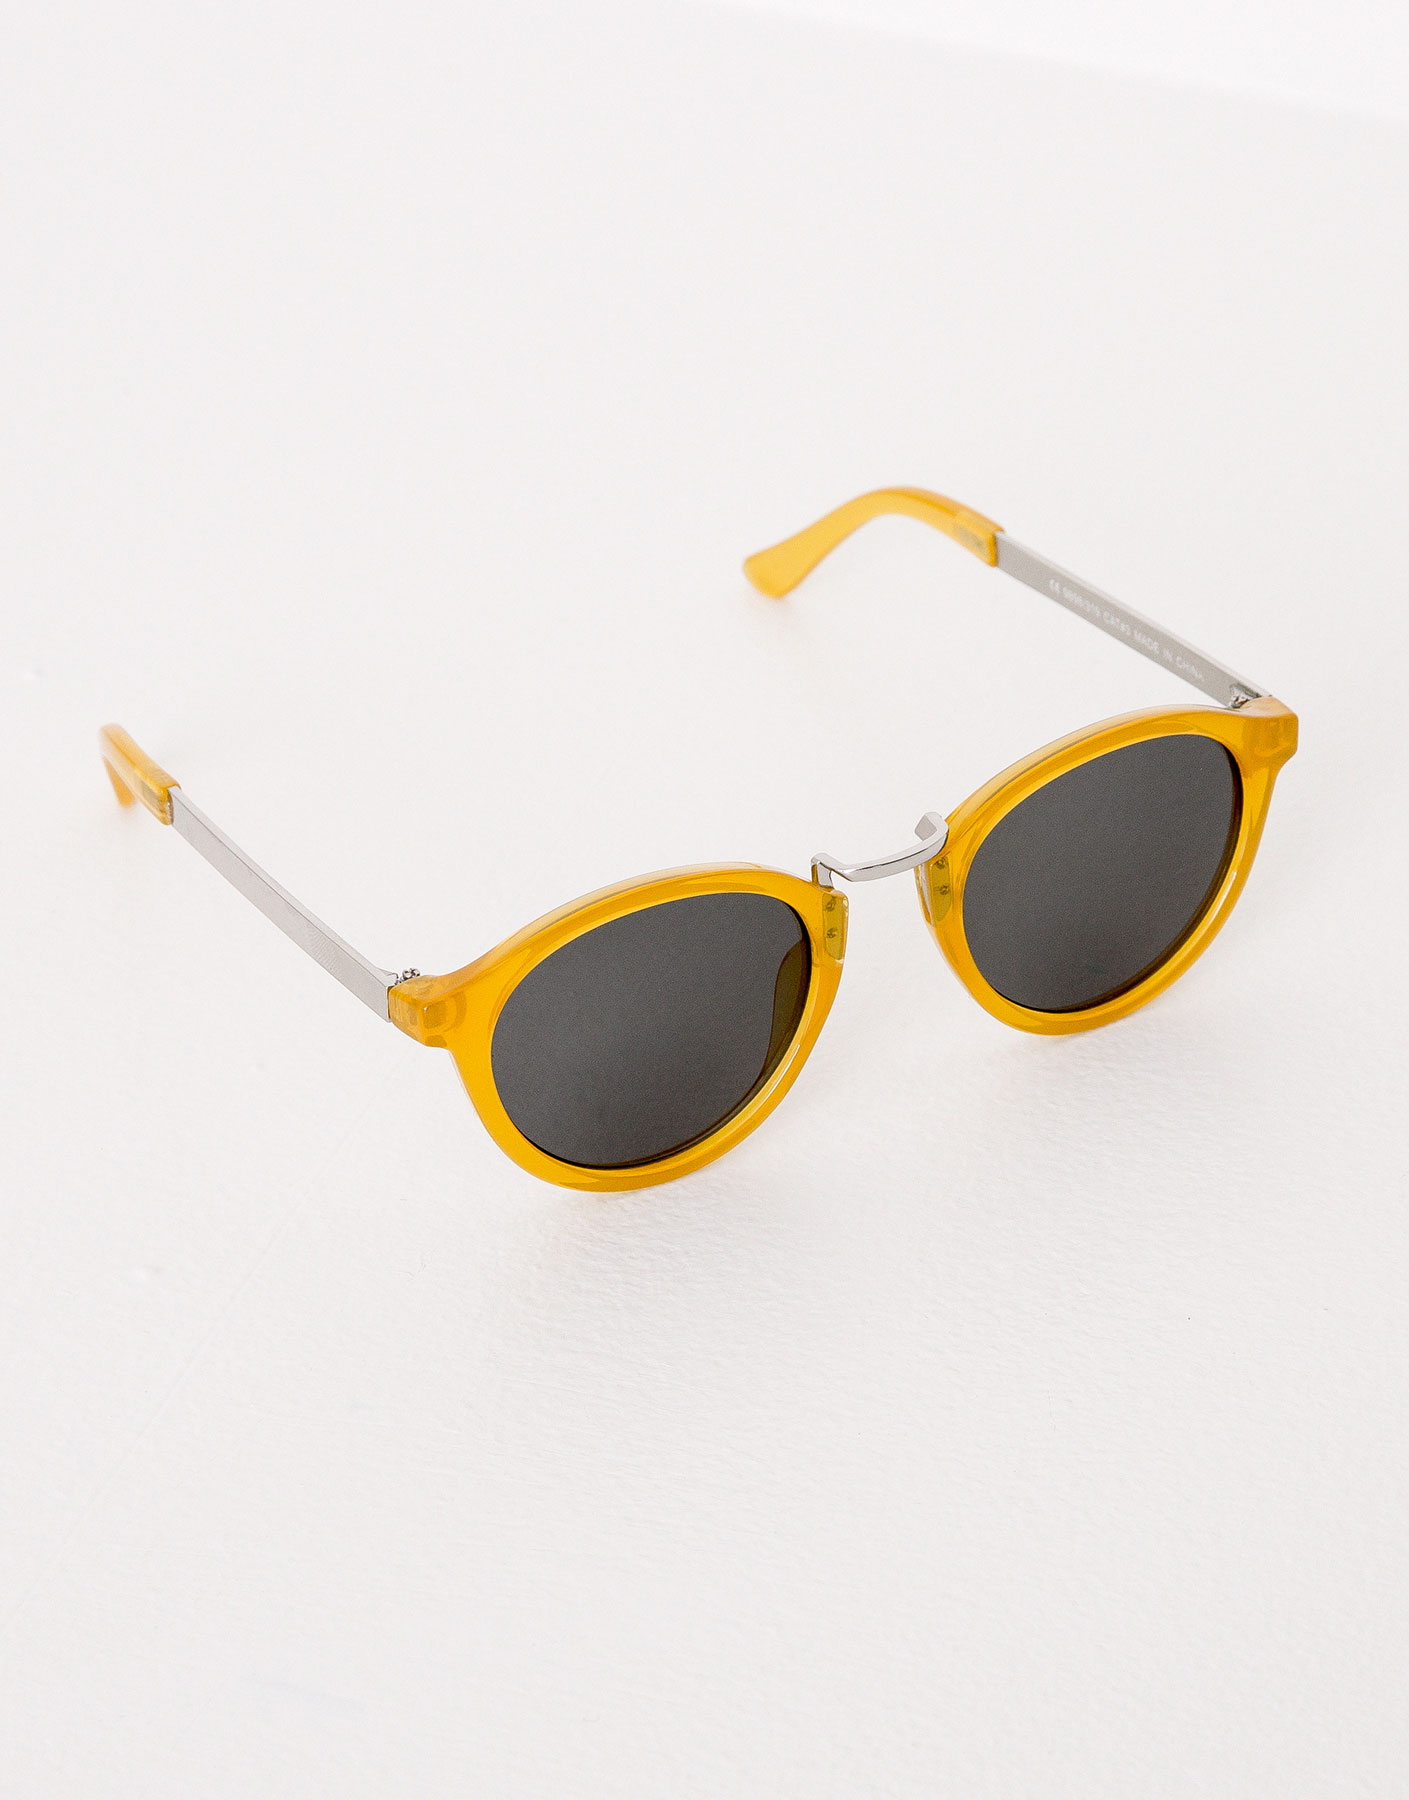 Gafas sol montura amarilla